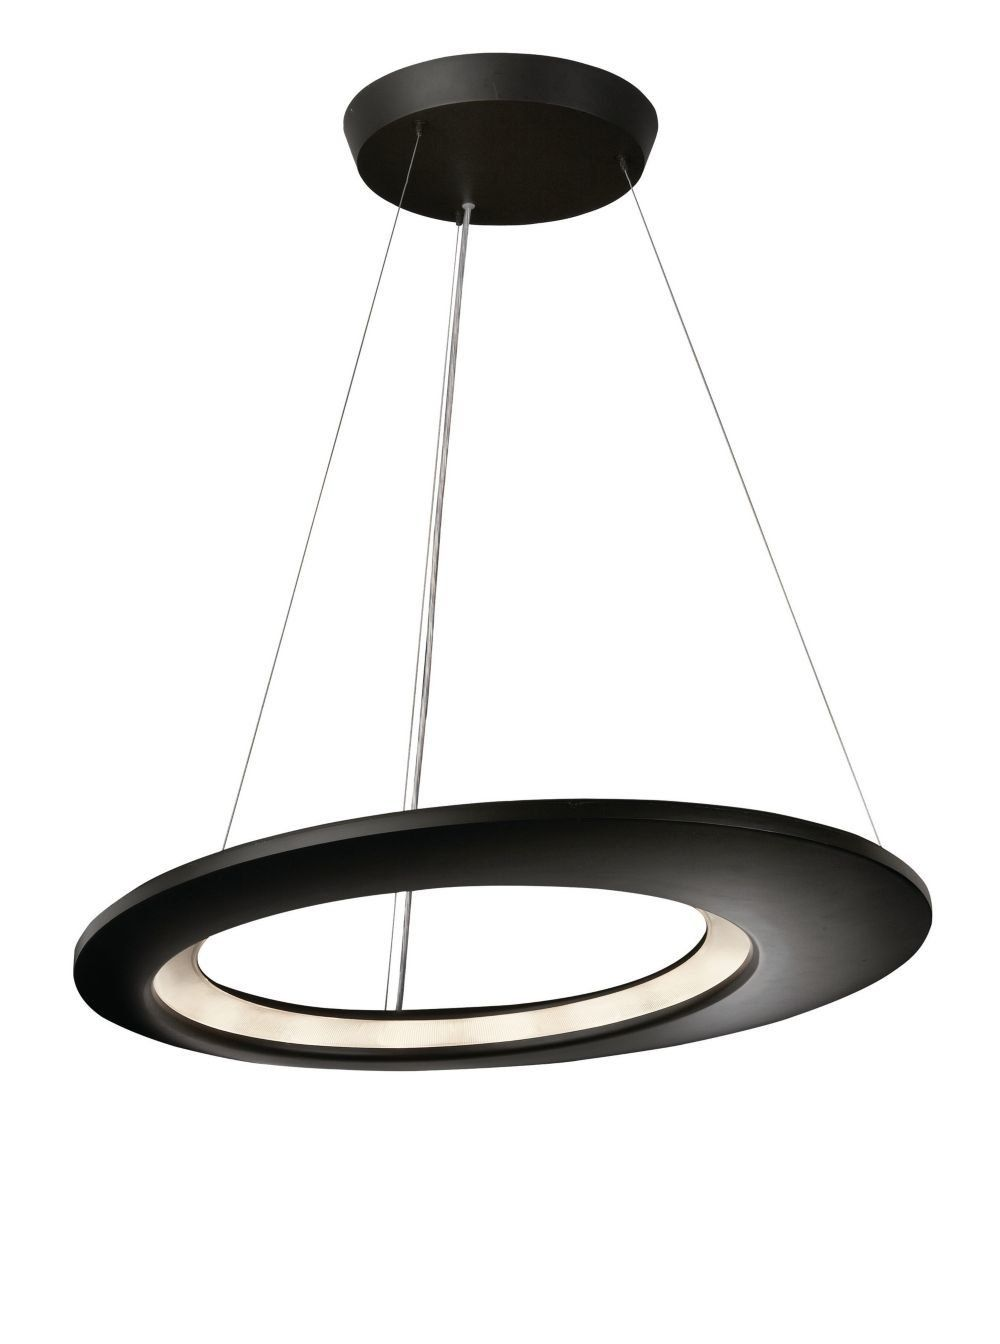 philips lirio ecliptic lampadario moderno powerled diametro 65 cm antracite amazonit